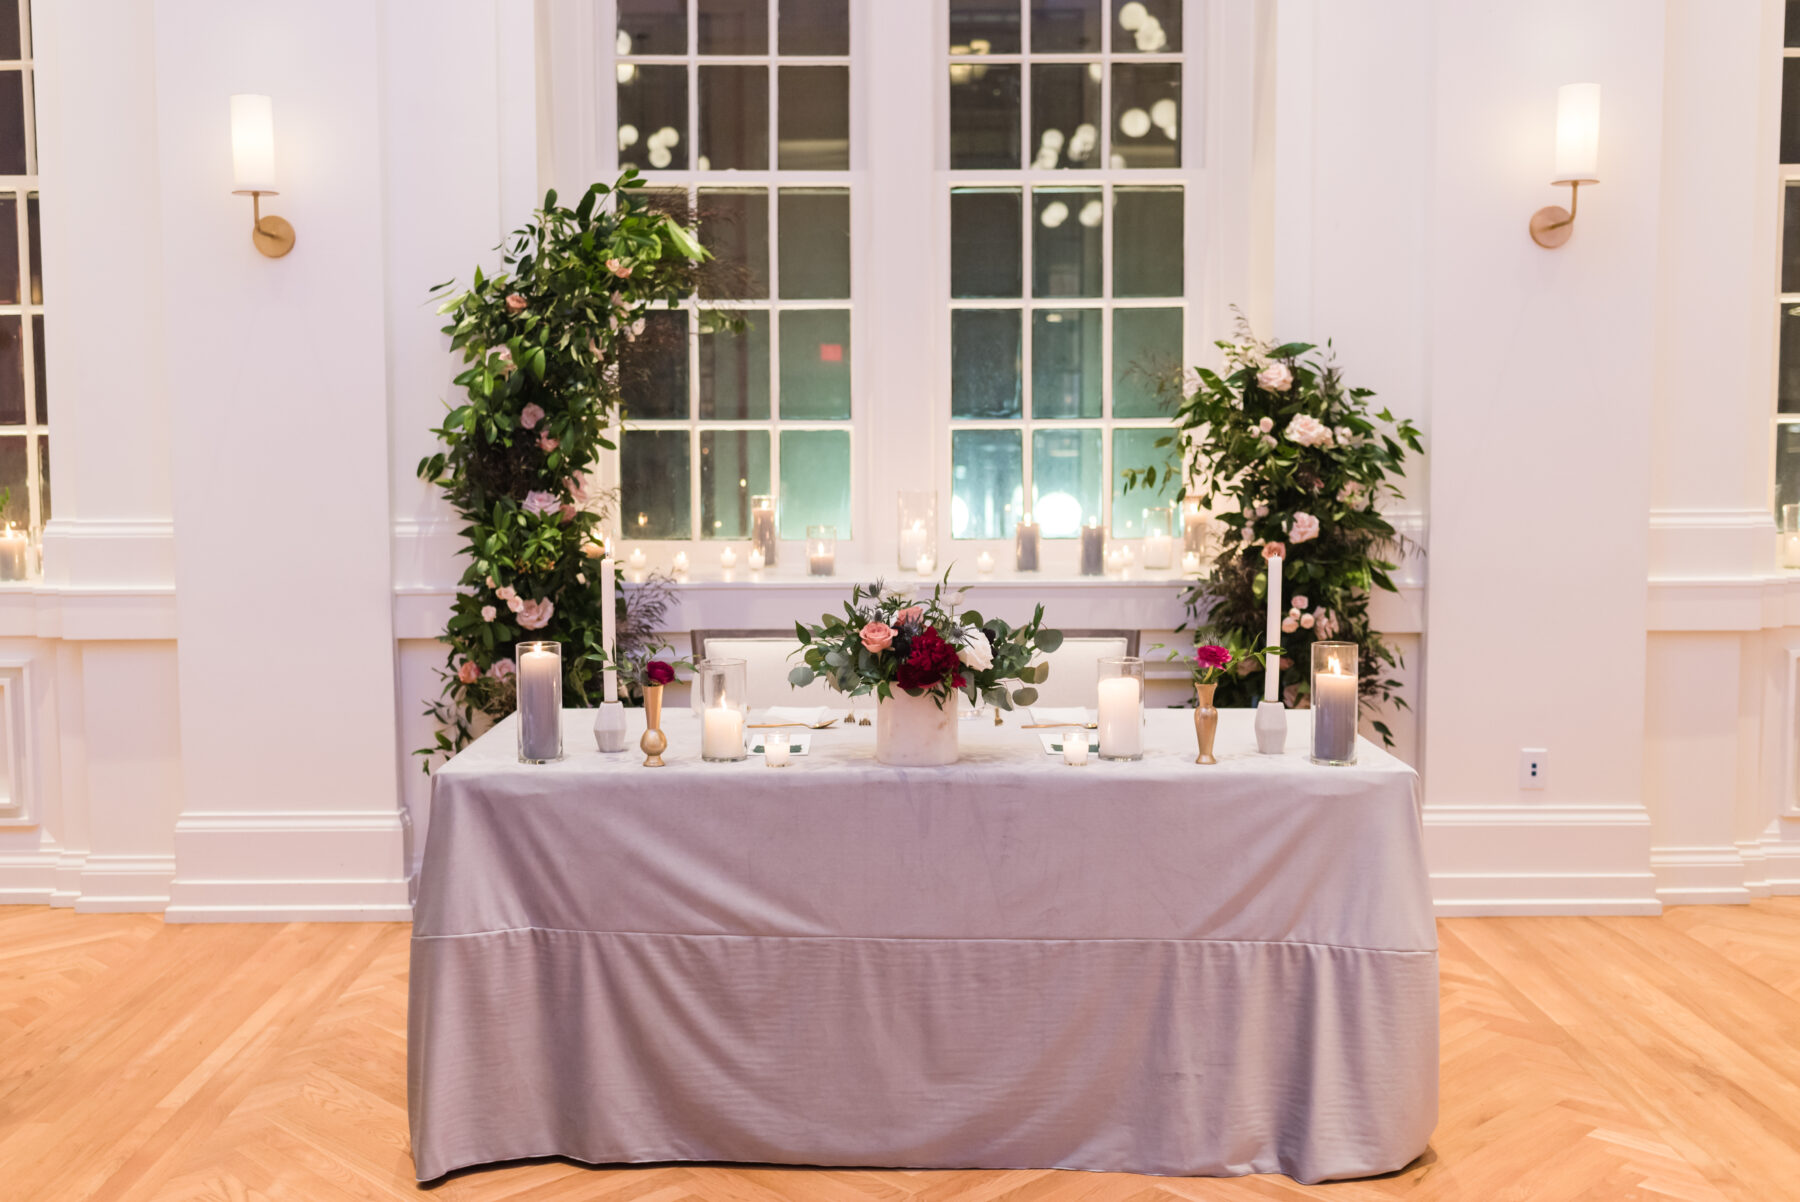 Moody Dinner Party Wedding at Noelle Nashville